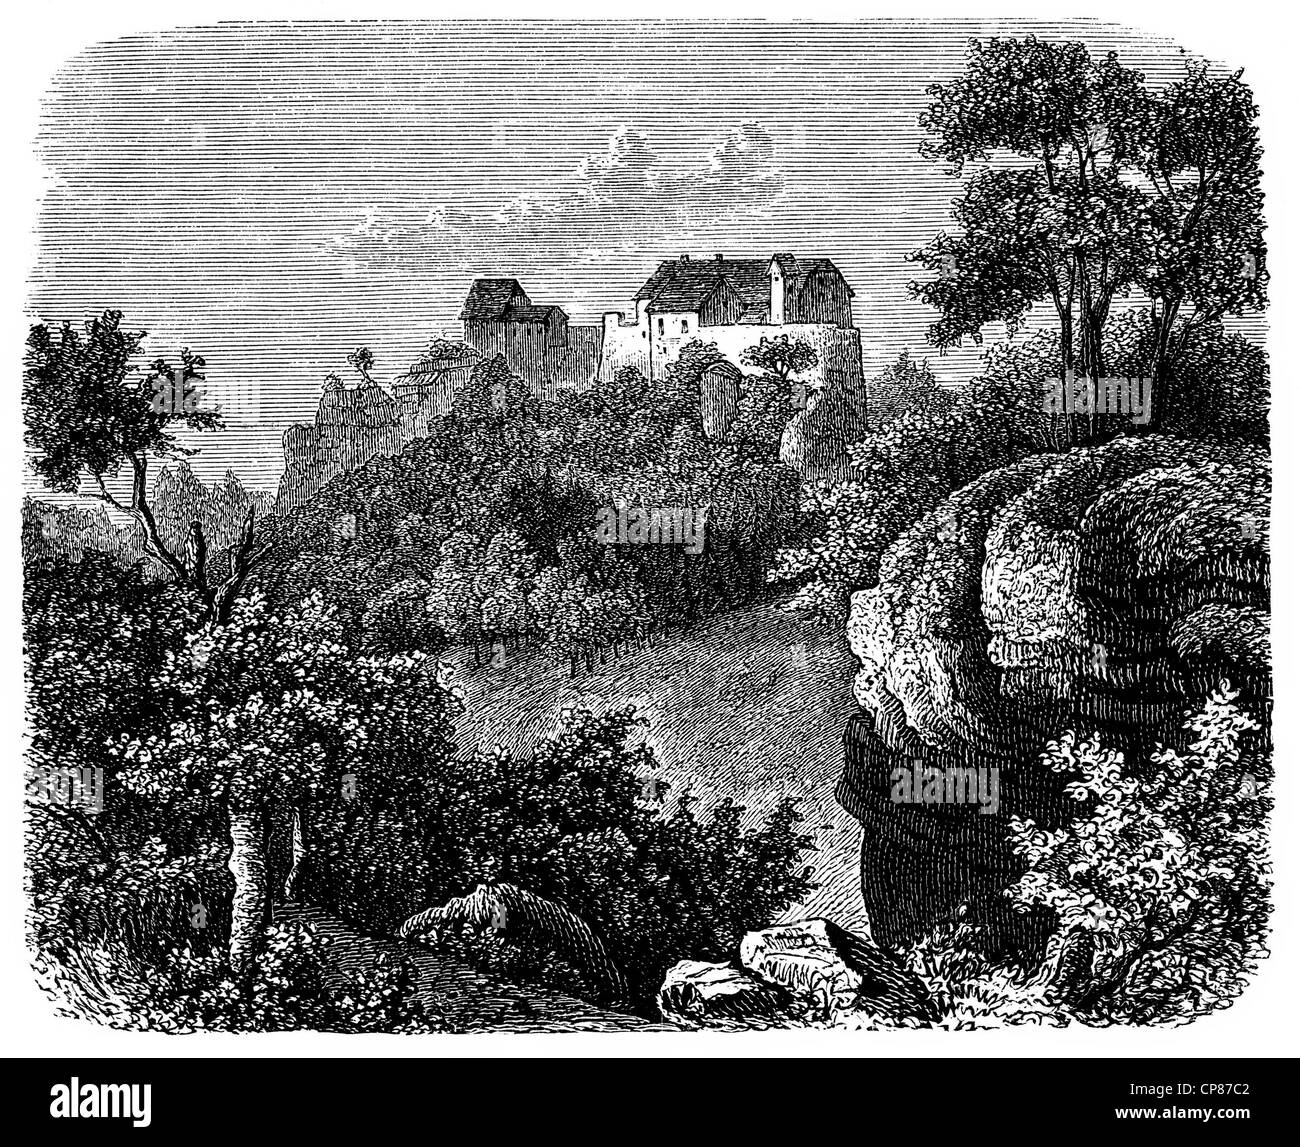 Wartburg Castle in the 18th century, Eisenach, Germany, historical engraving, 19th Century , Die Wartburg im 18. - Stock Image